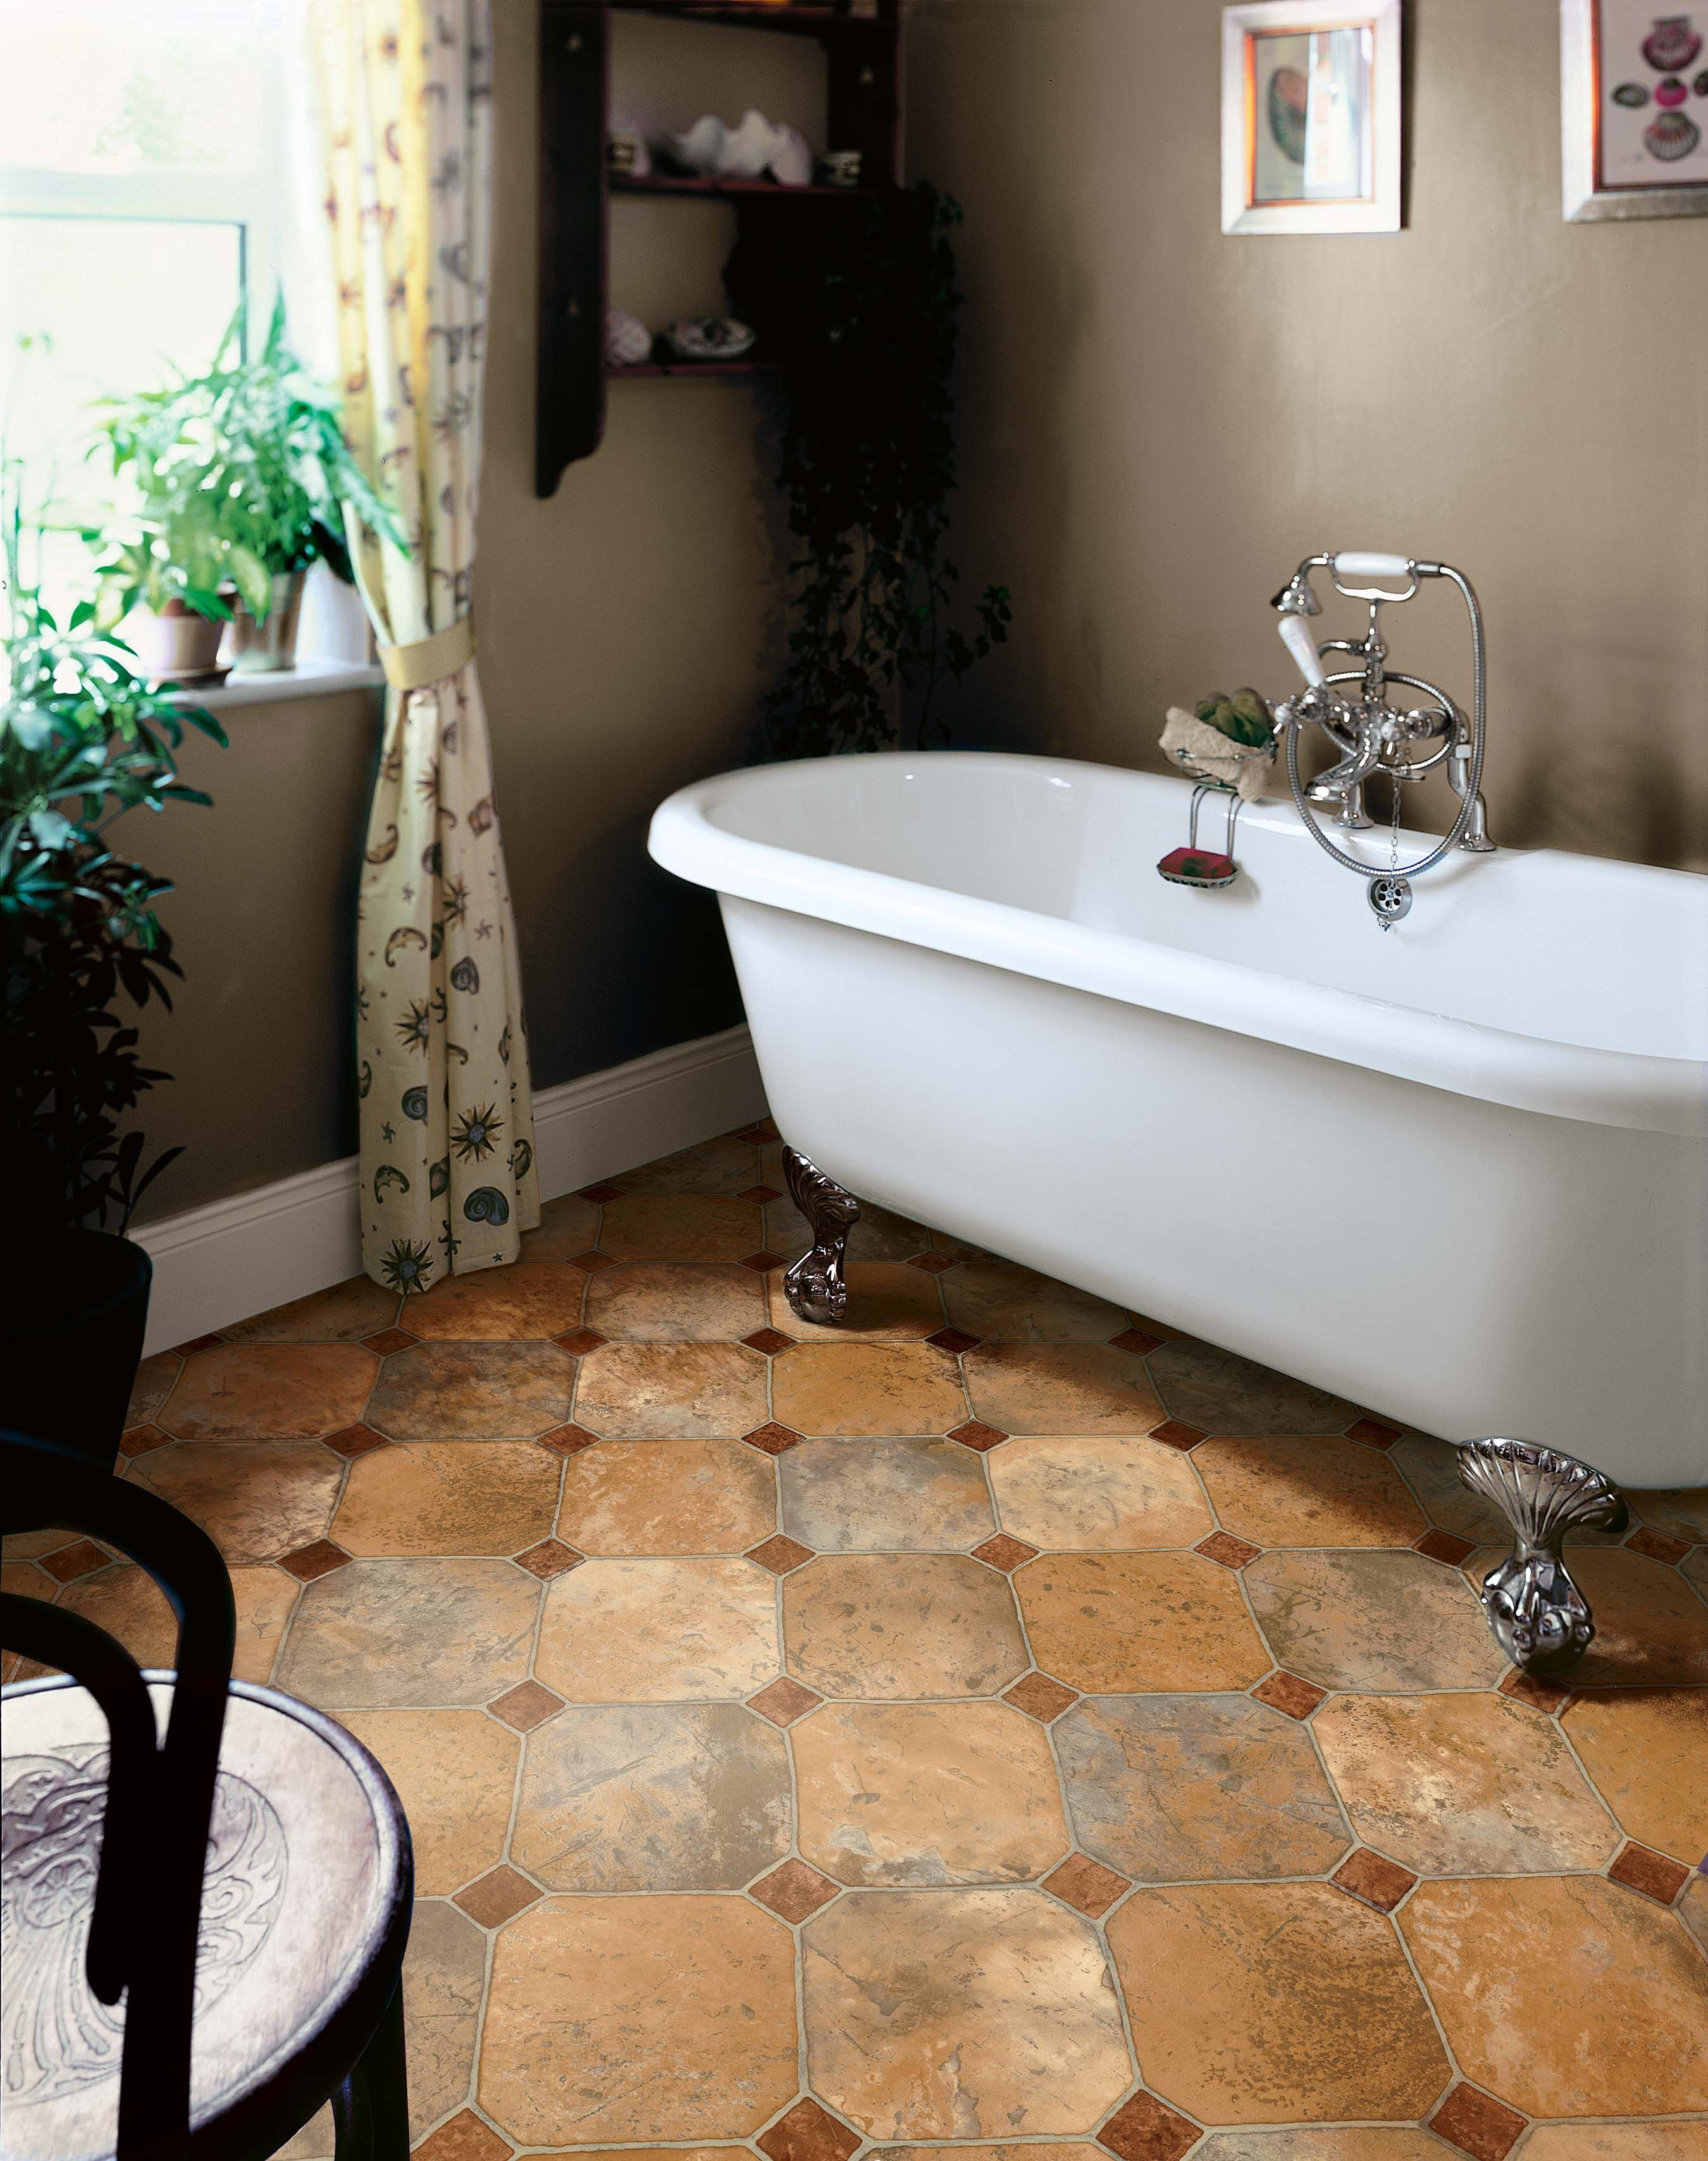 Asbestos Under Bathroom Tiles With Original Type Eyagci Com With Images Vinyl Sheet Flooring Bathroom Wall Tile Diy Bathtub